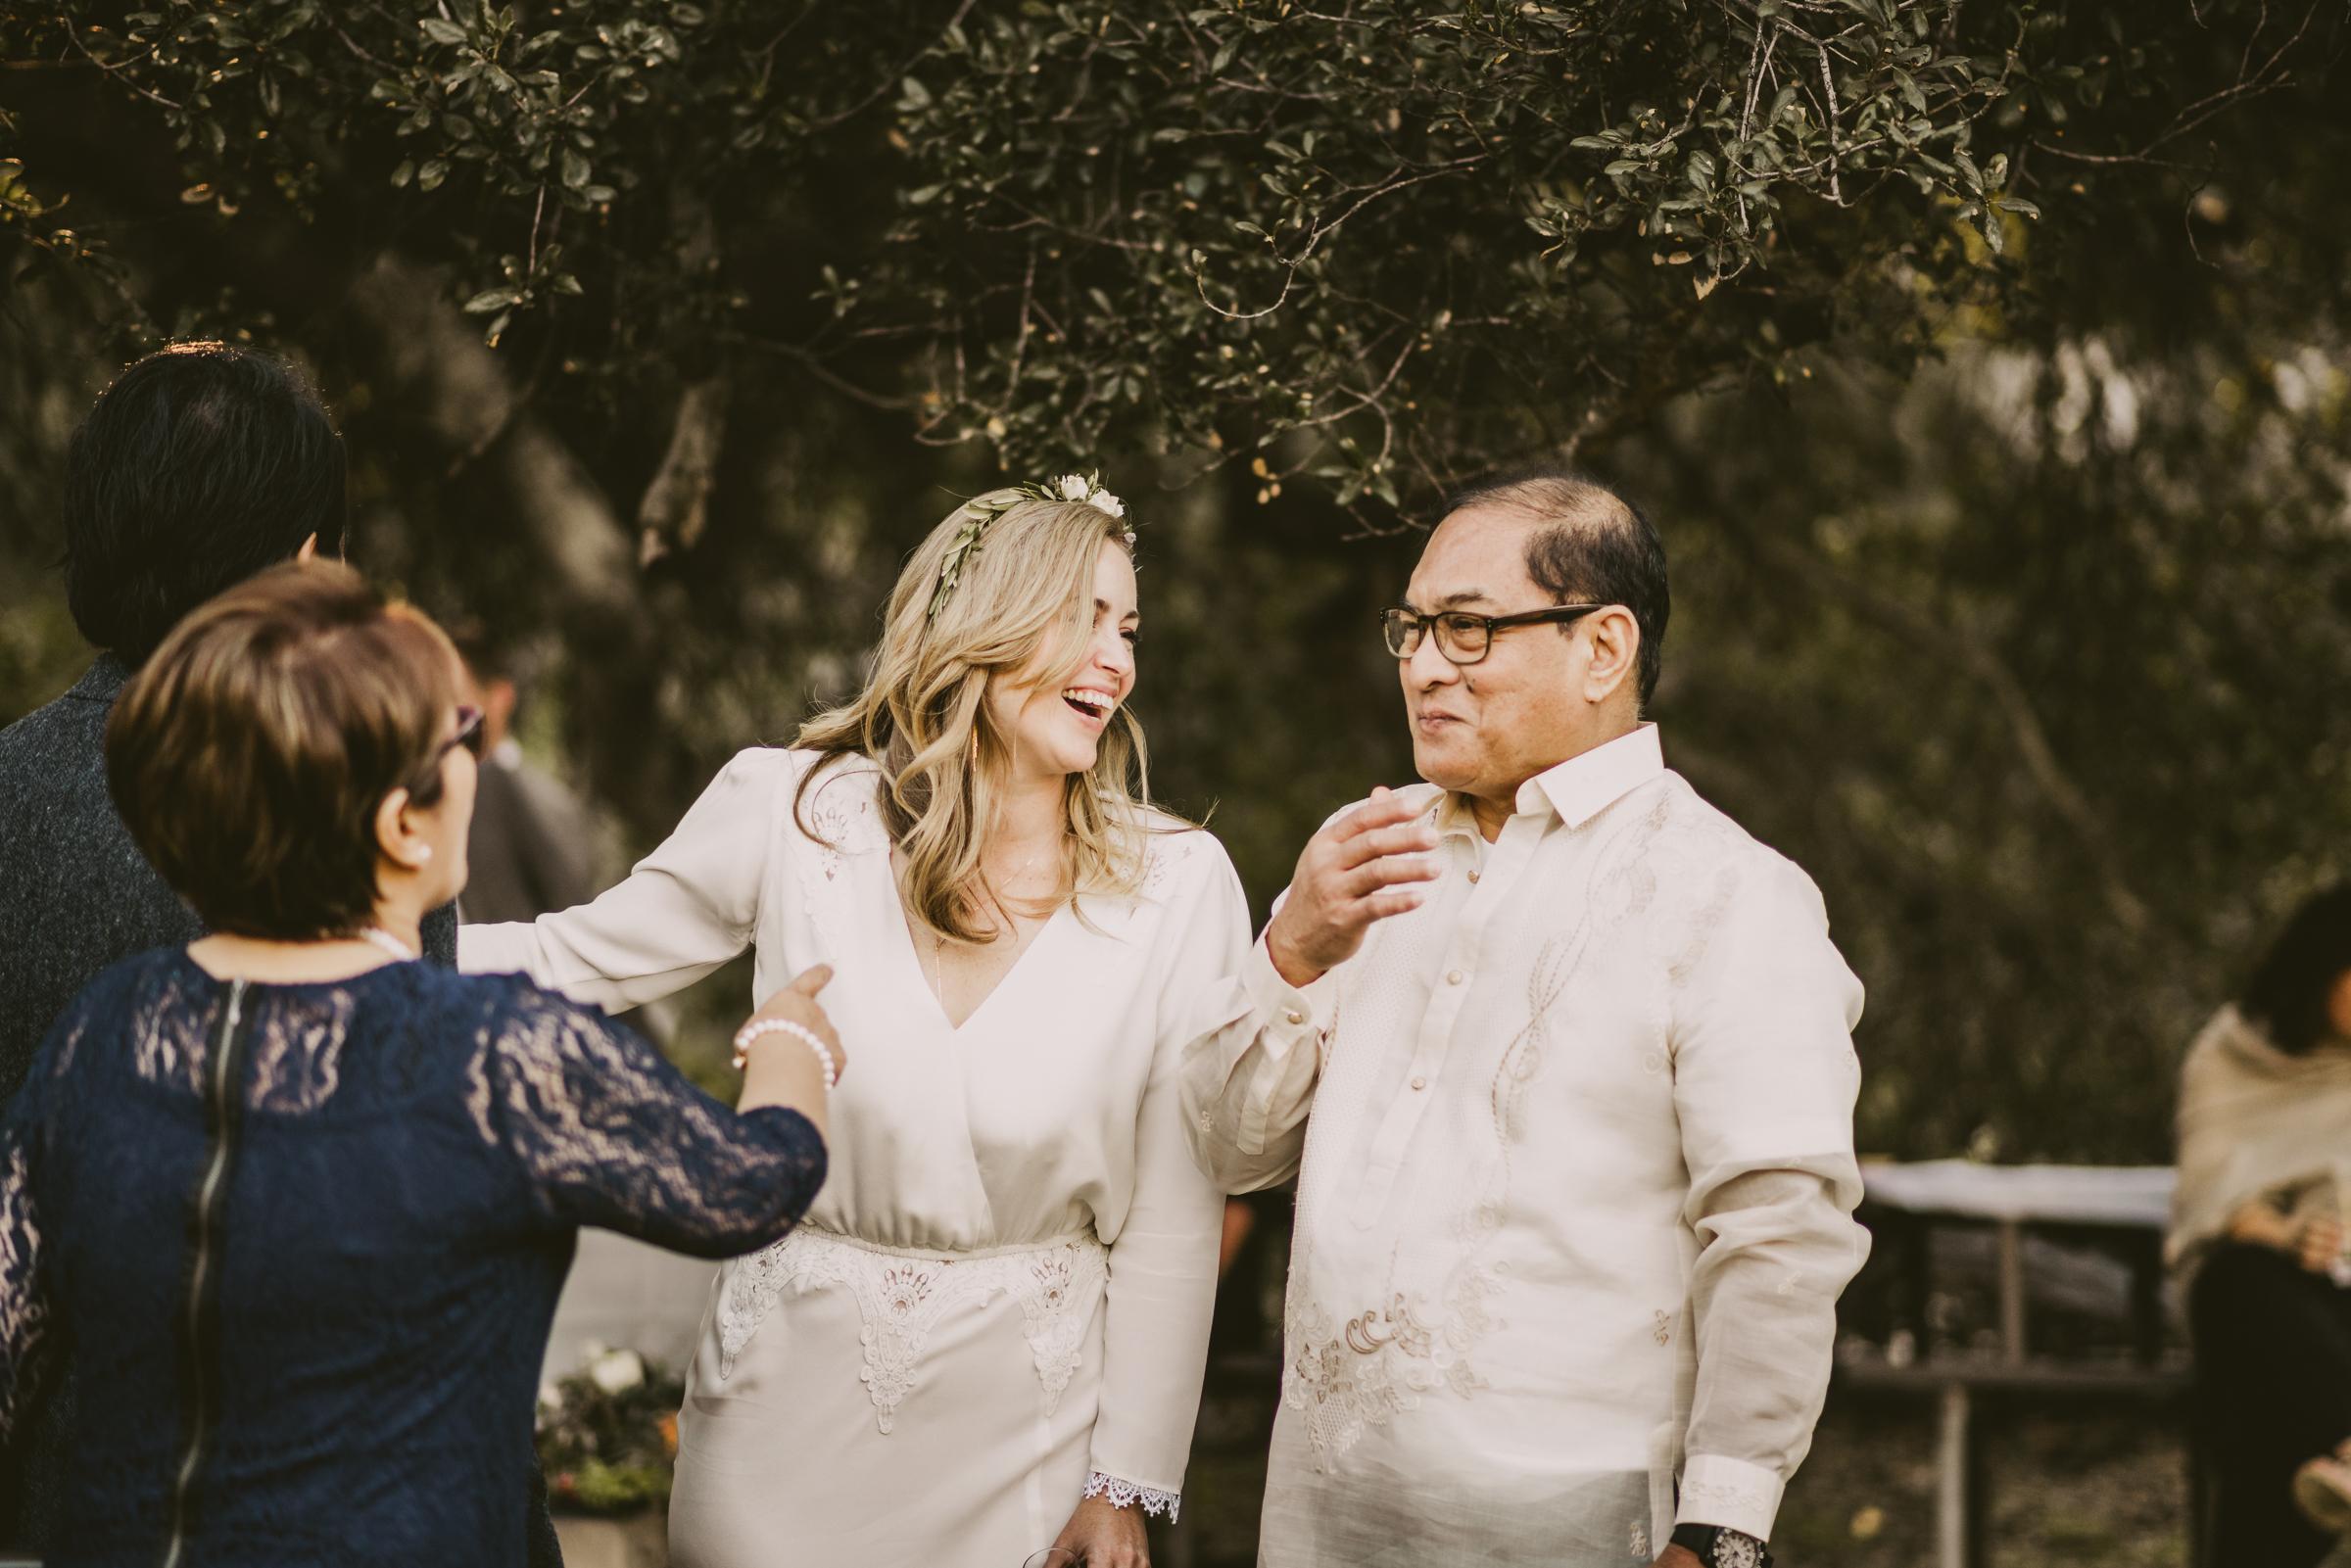 ©Isaiah + Taylor Photography - Intimate Elopement, Eaton Canyon, Los Angeles Wedding Photographer-52.jpg